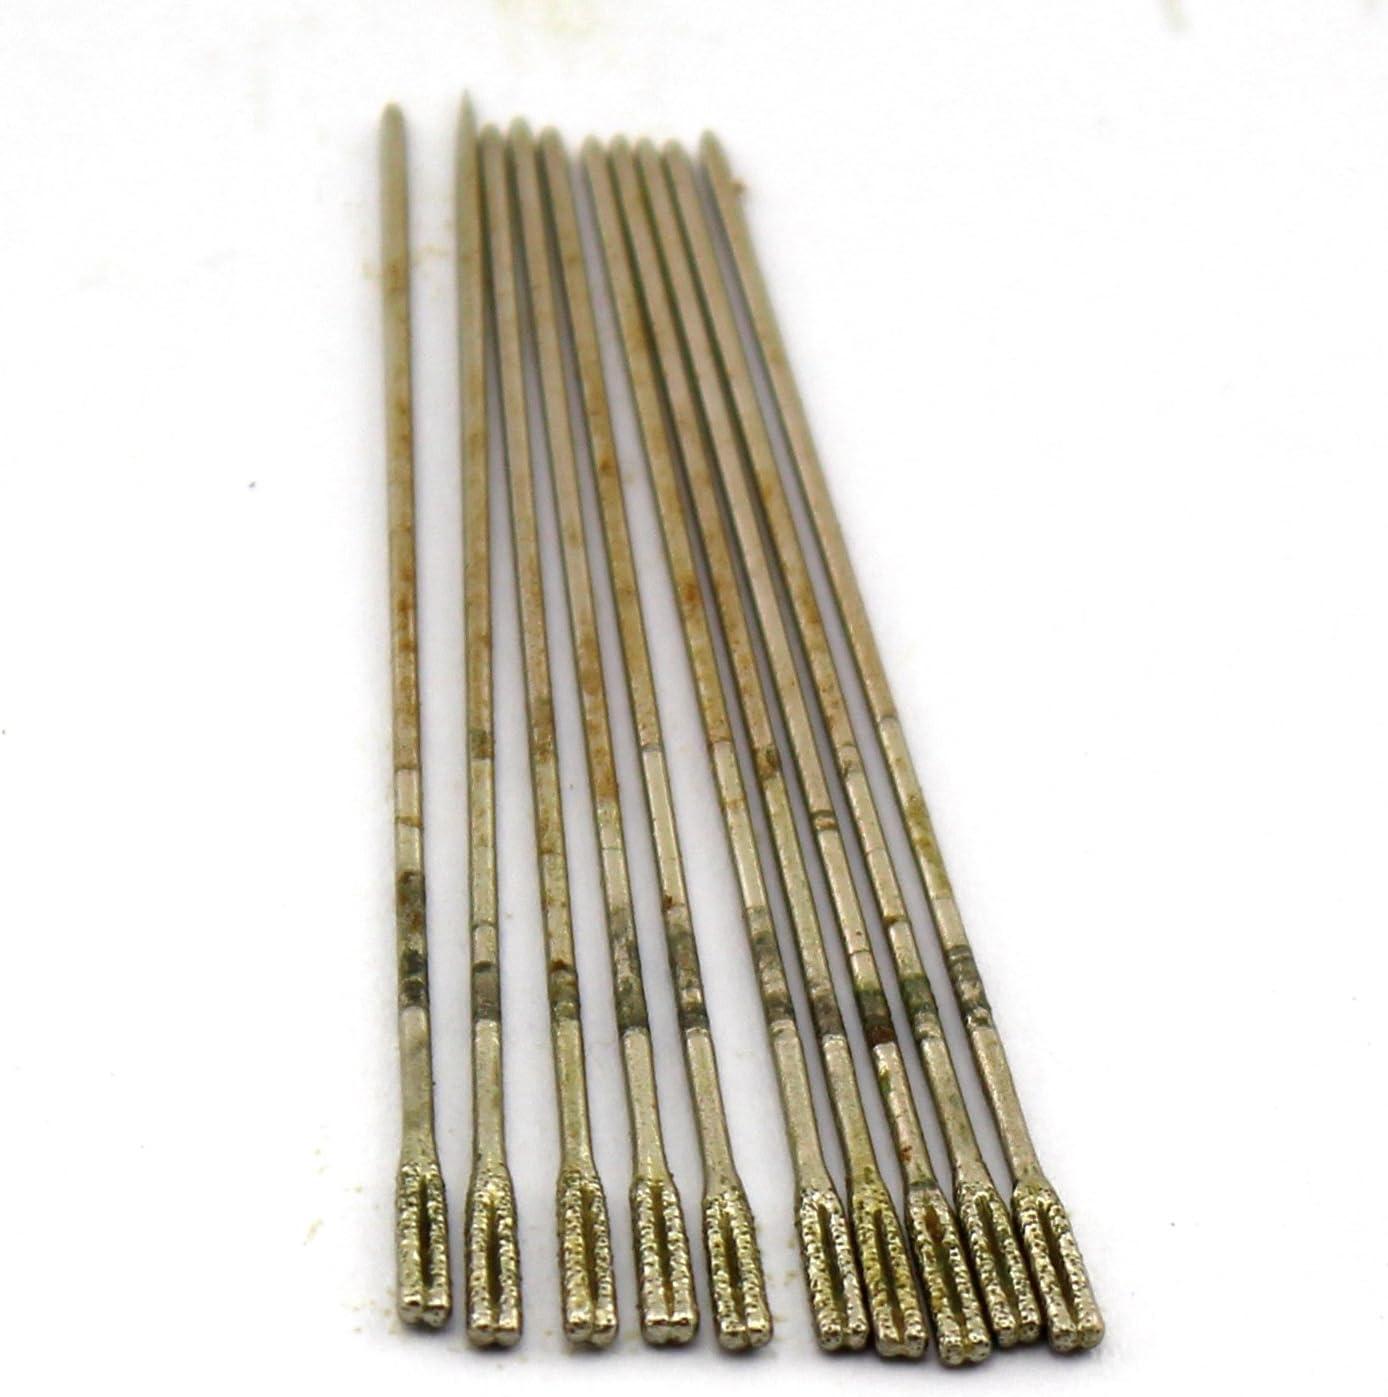 Oxide Finish.8125 Flute Length RedLine Tools RD41836 Mechanics Length Drill Bit 1.8125 OAL #36 Pack of 12 .1065